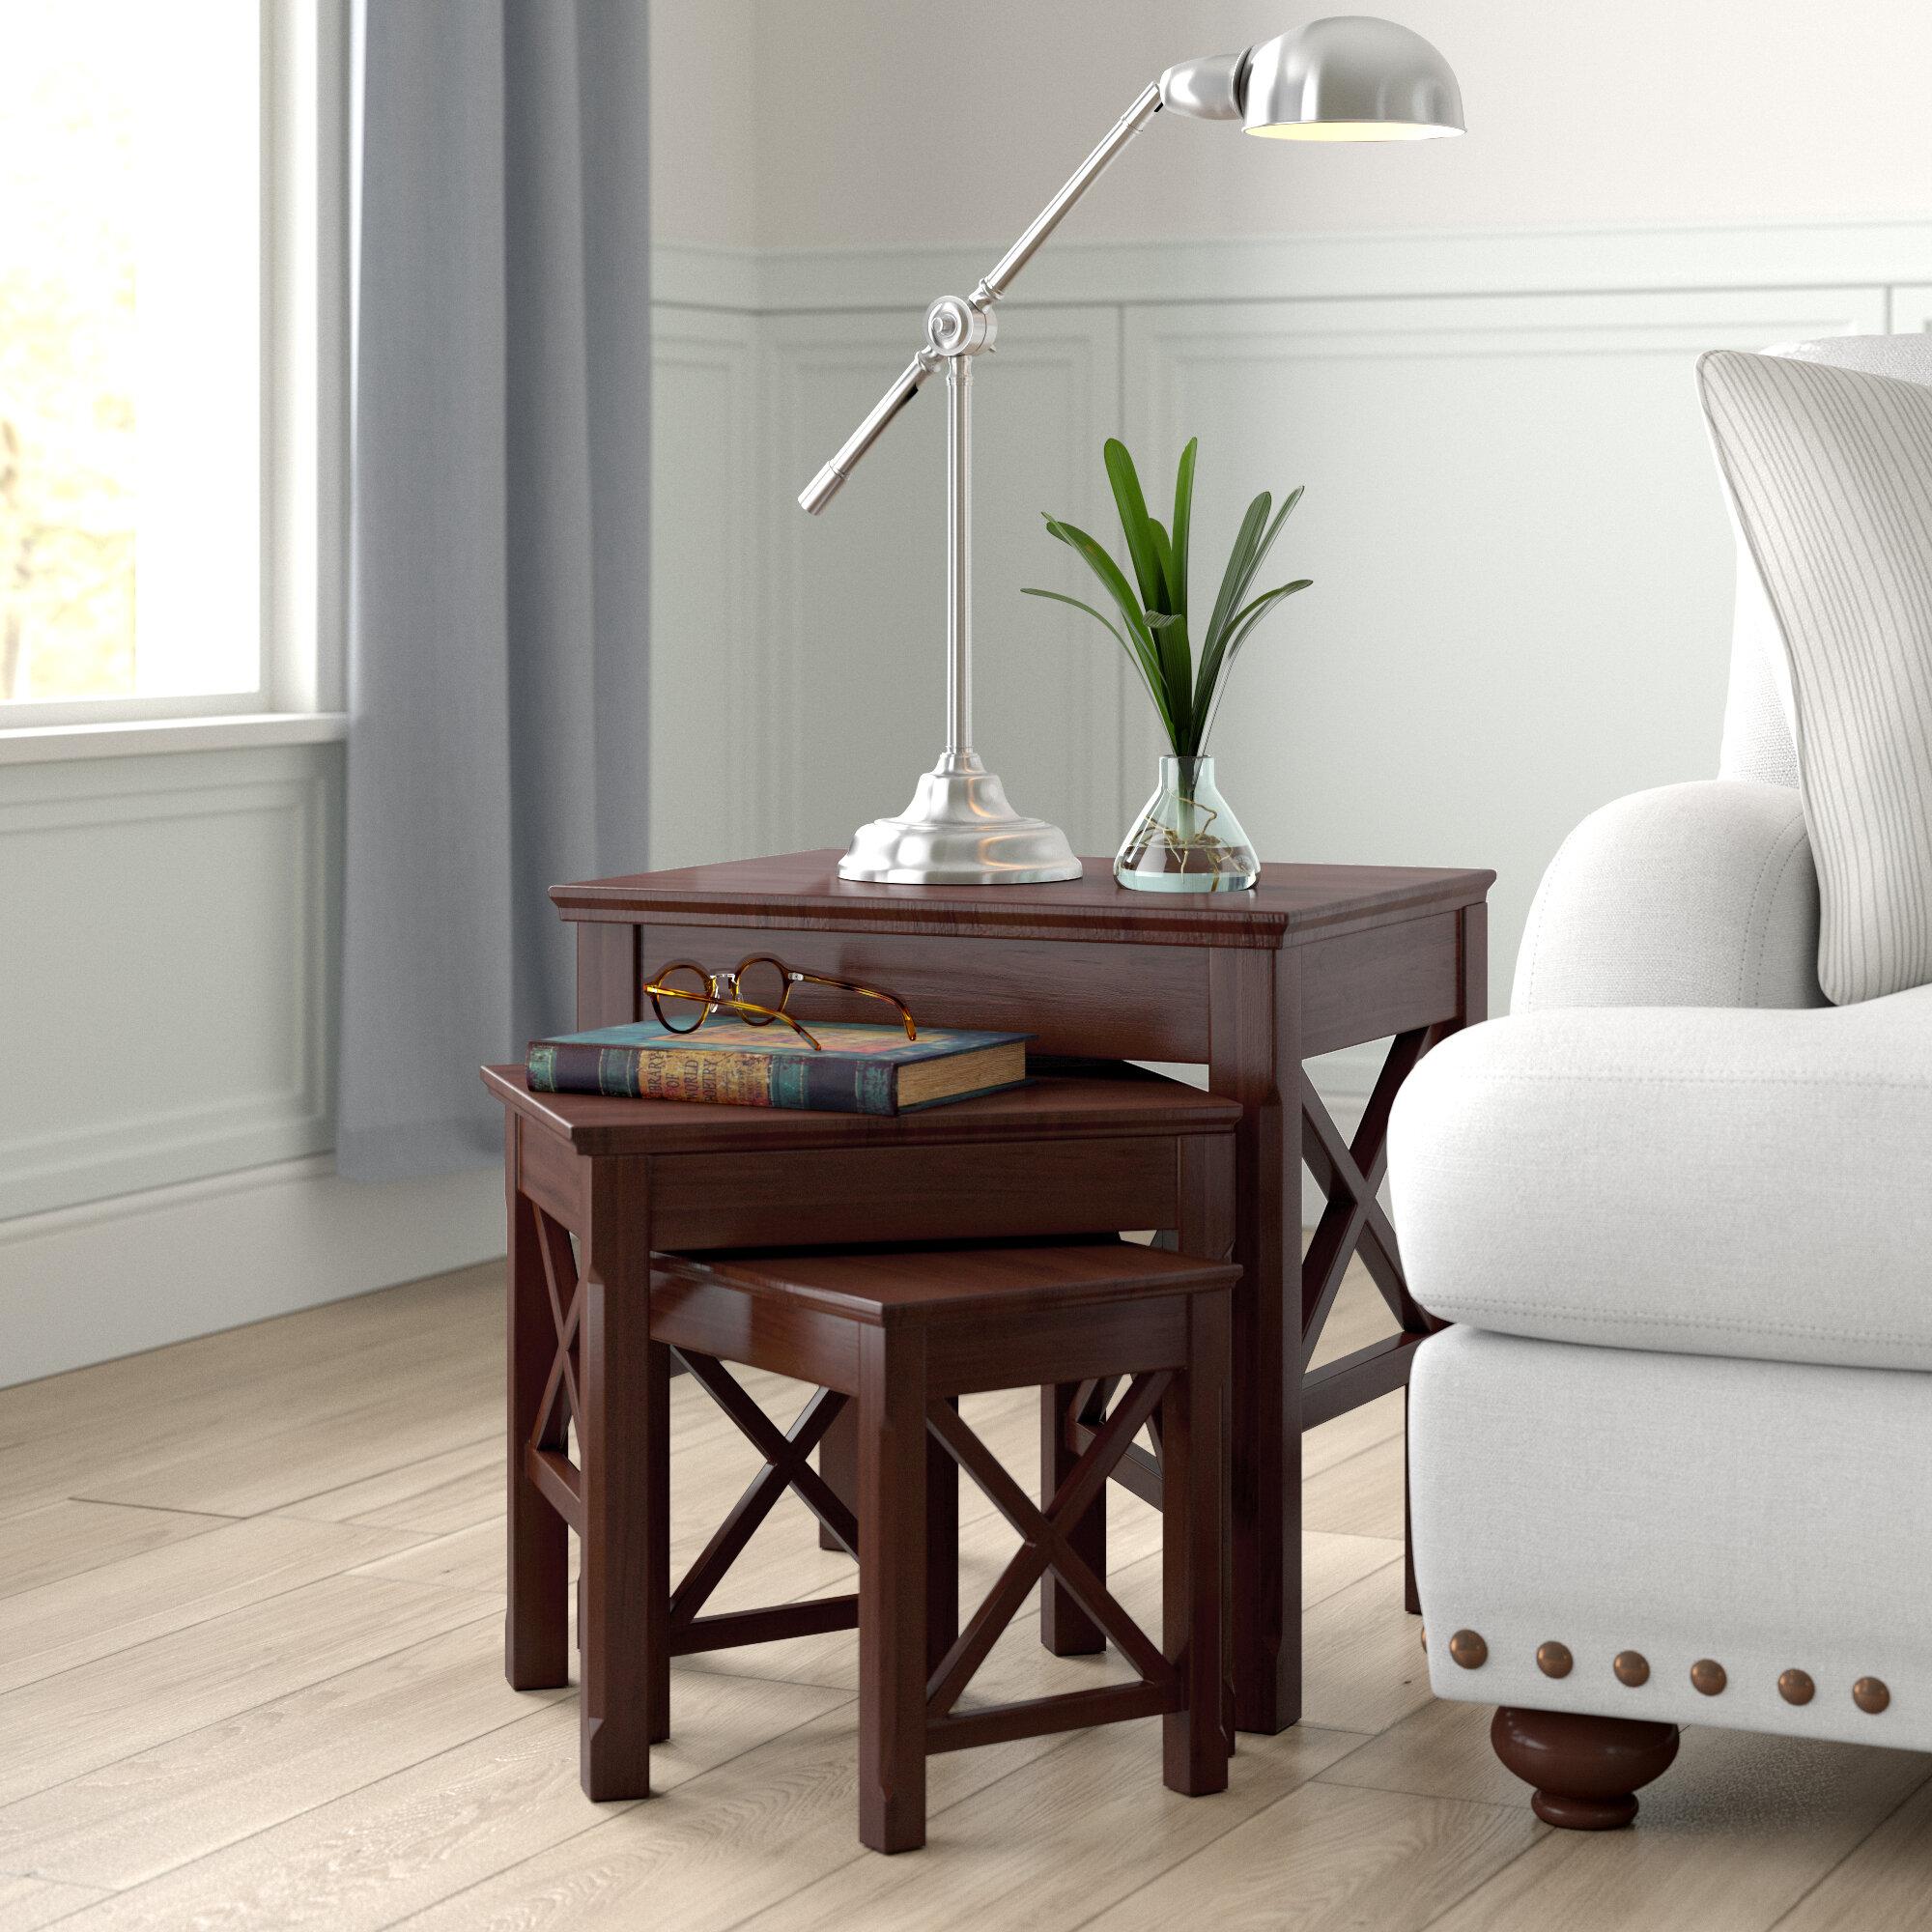 Medium Wood Rectangle Nesting Tables You Ll Love In 2021 Wayfair